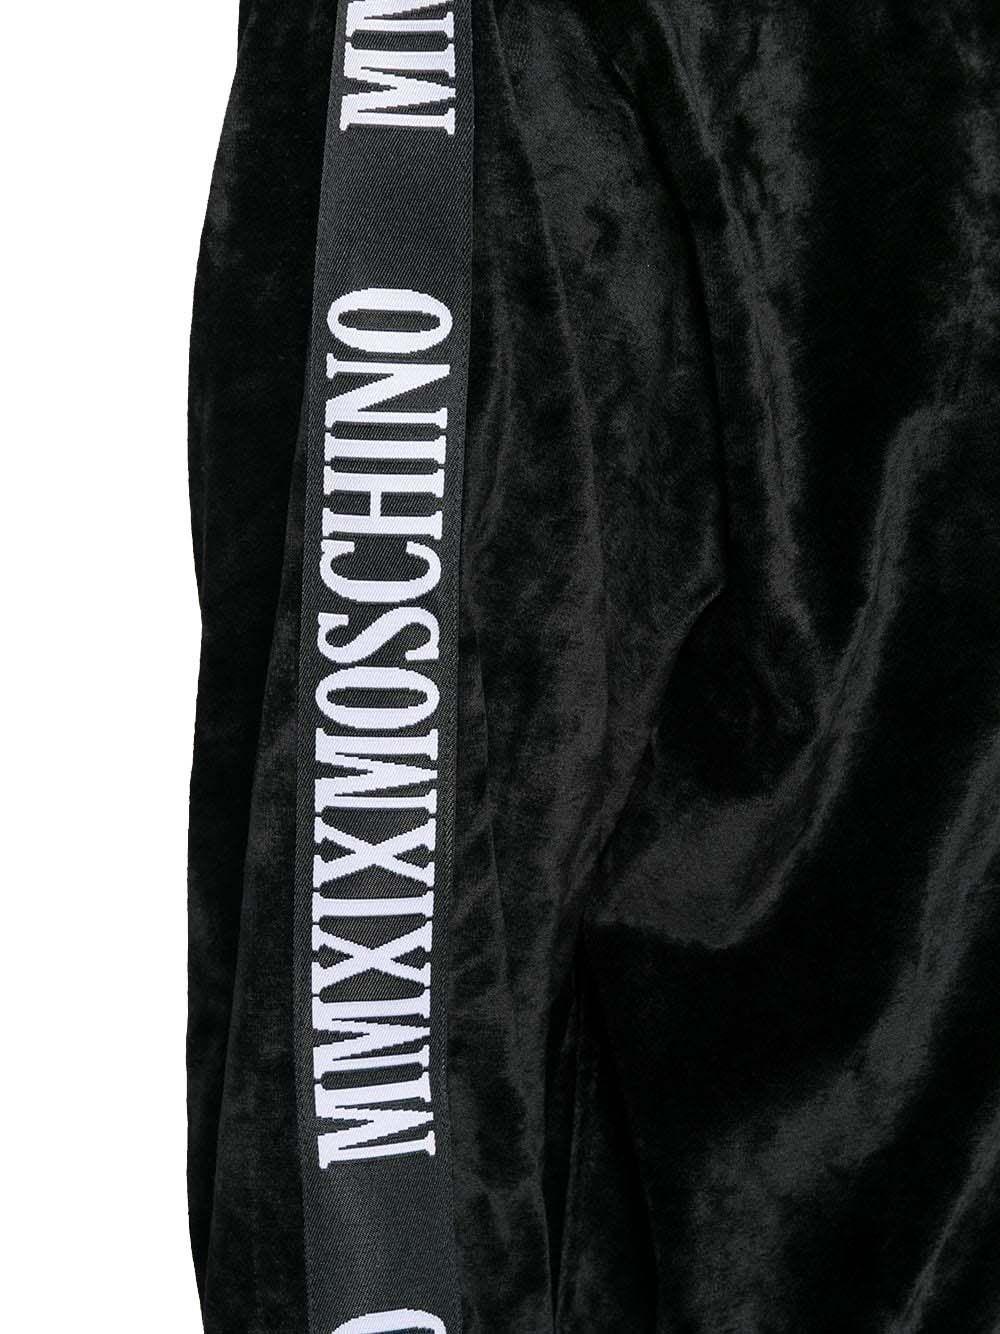 MOSCHINO WOMEN'S A171255291555 BLACK VISCOSE SWEATSHIRT